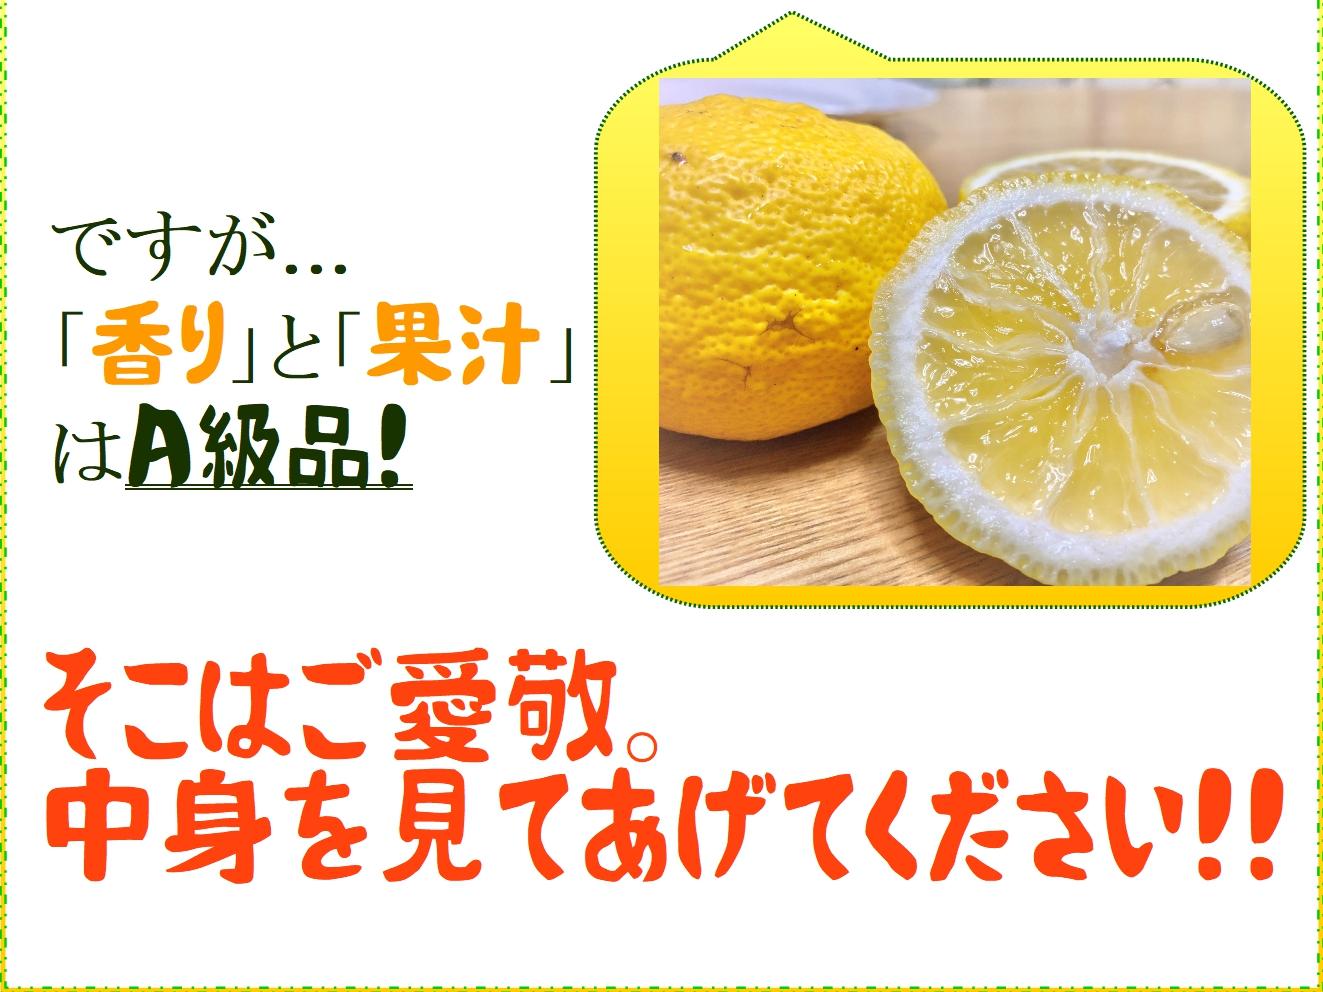 yuzu050.jpg